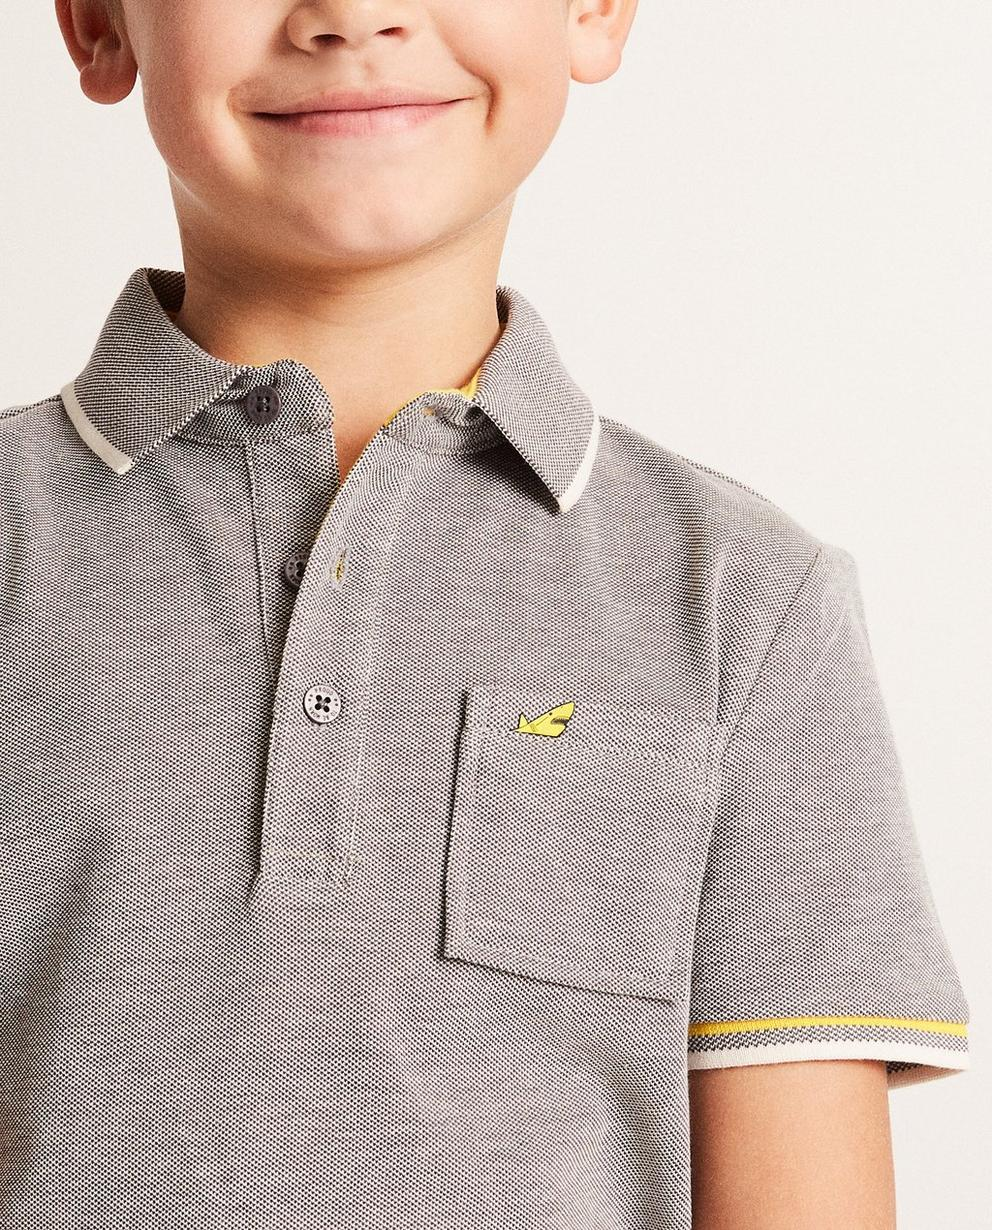 Polos - Dunkelgrau - Polo mit gelben Details